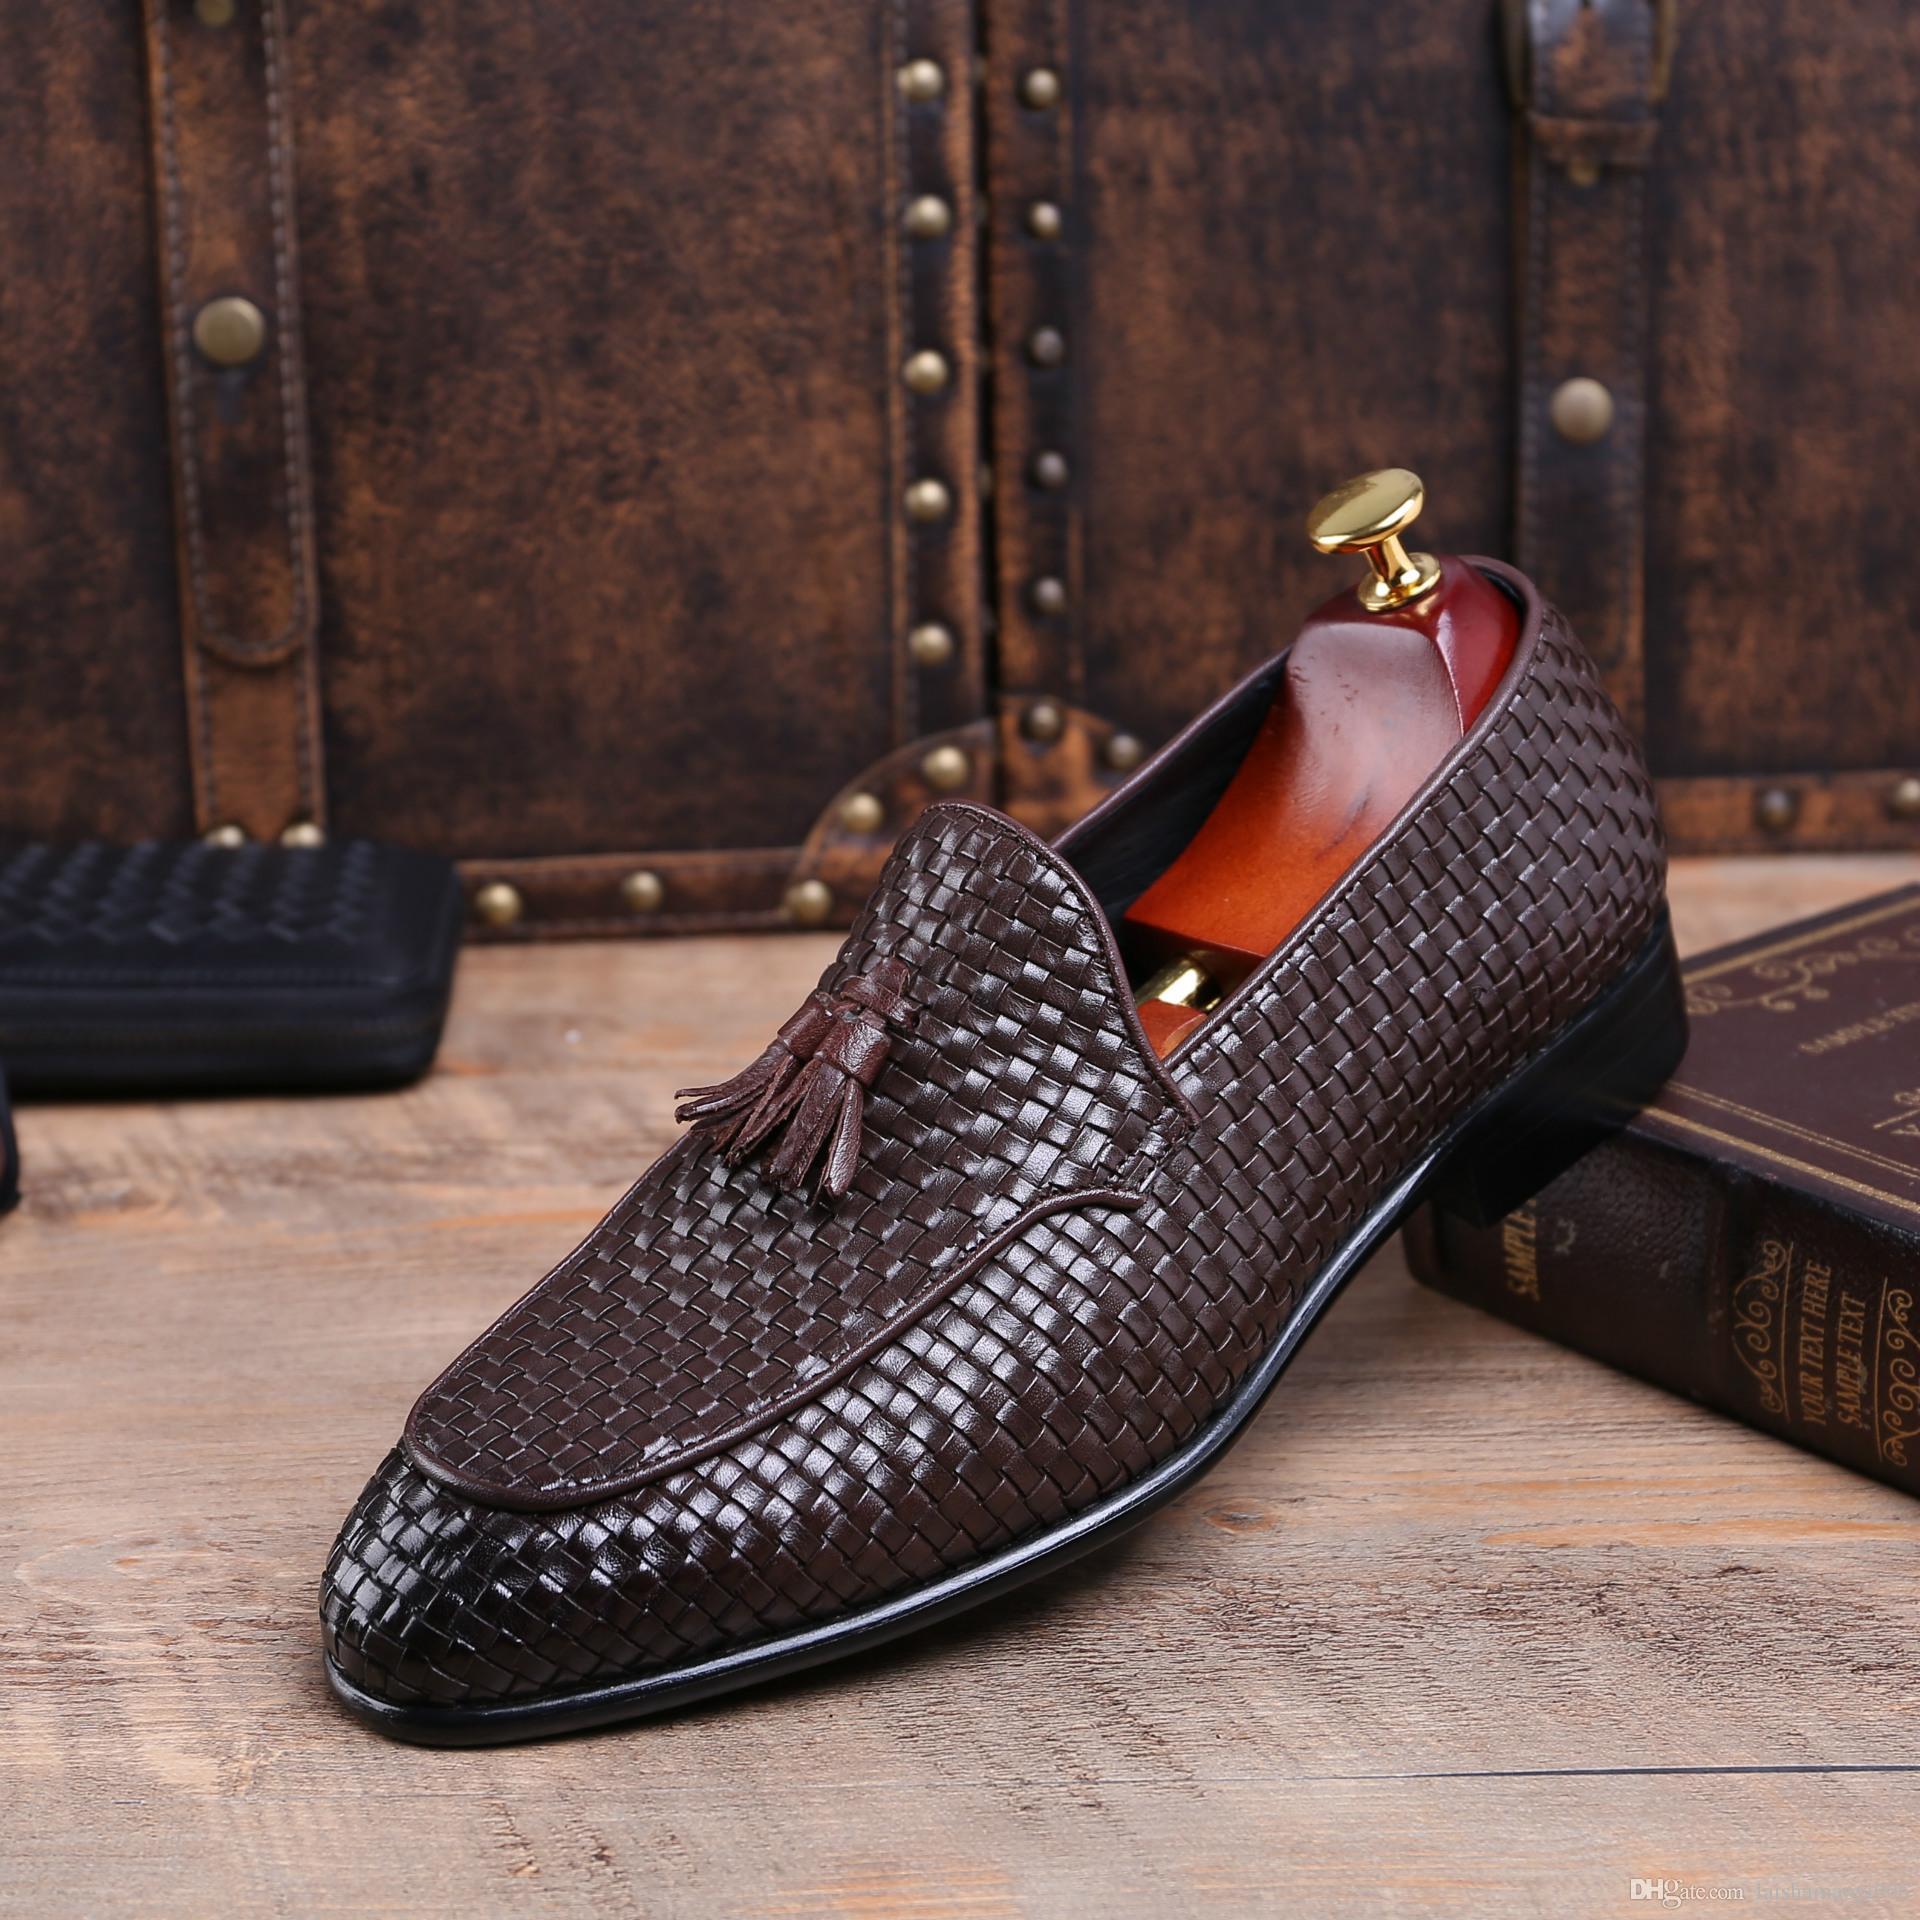 Grosshandel Mode Italienische Manner Schuhe Aus Echtem Leder Herren